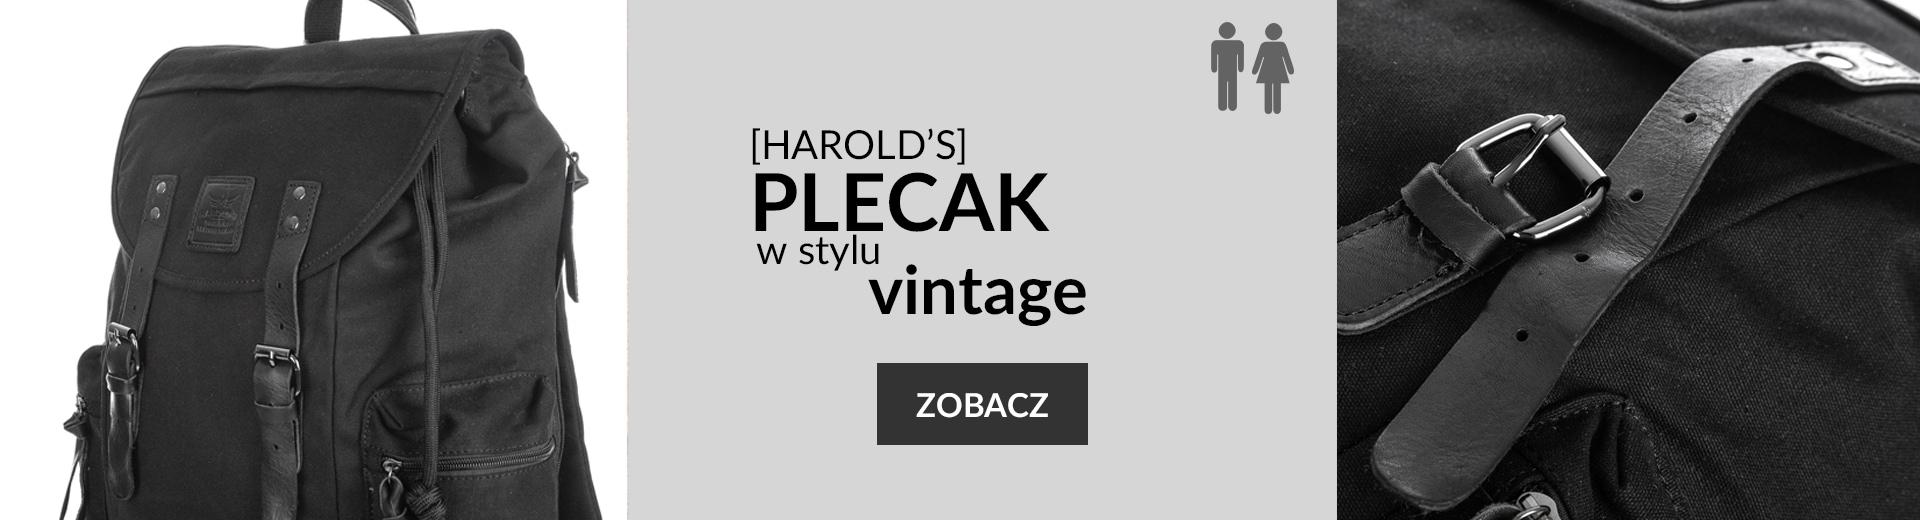 Czarny plecak ze skórą naturalną Harold's Vintage